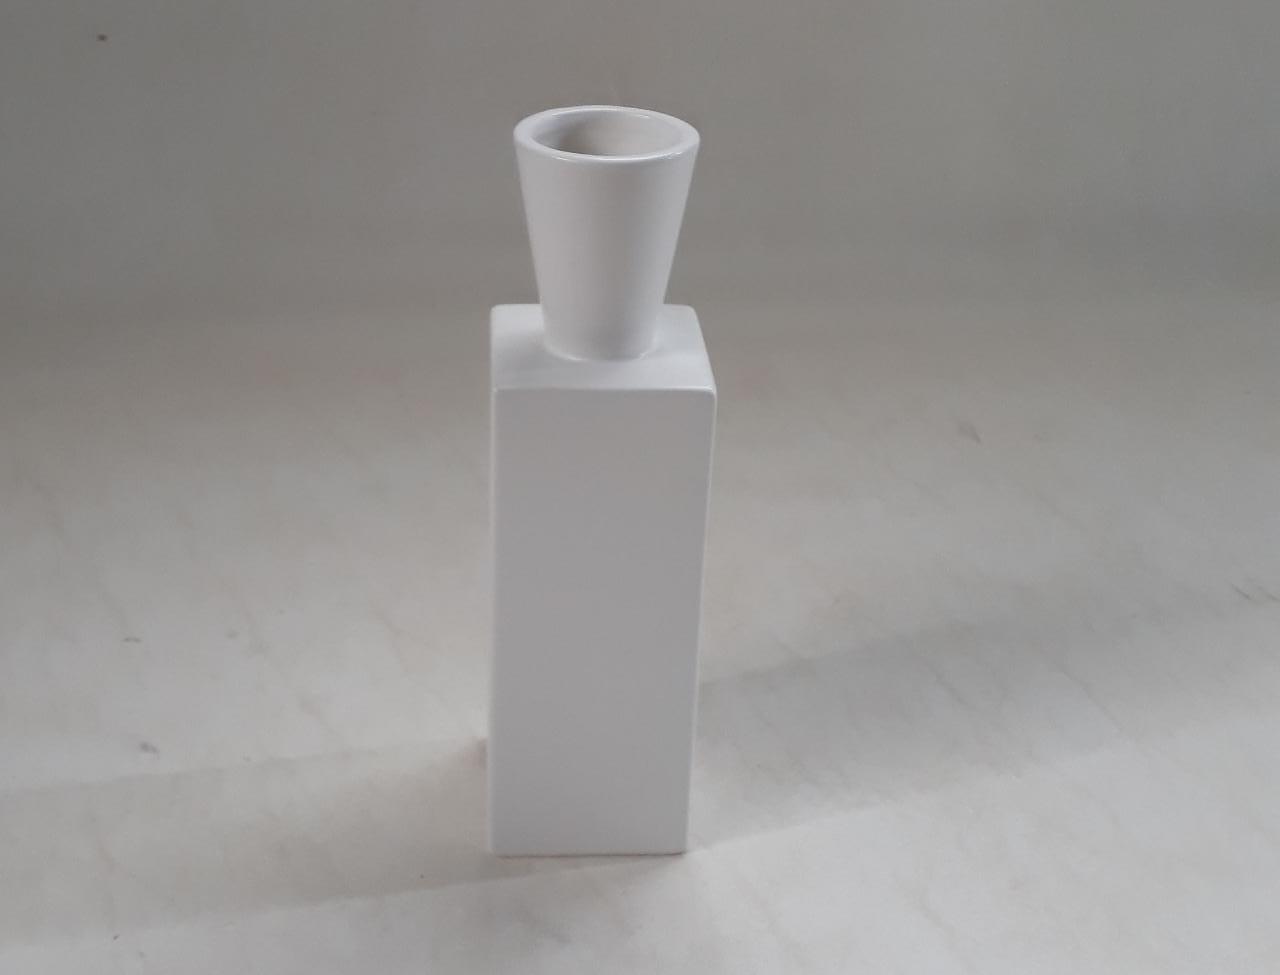 Vaso Decorativo Cerâmica Branco